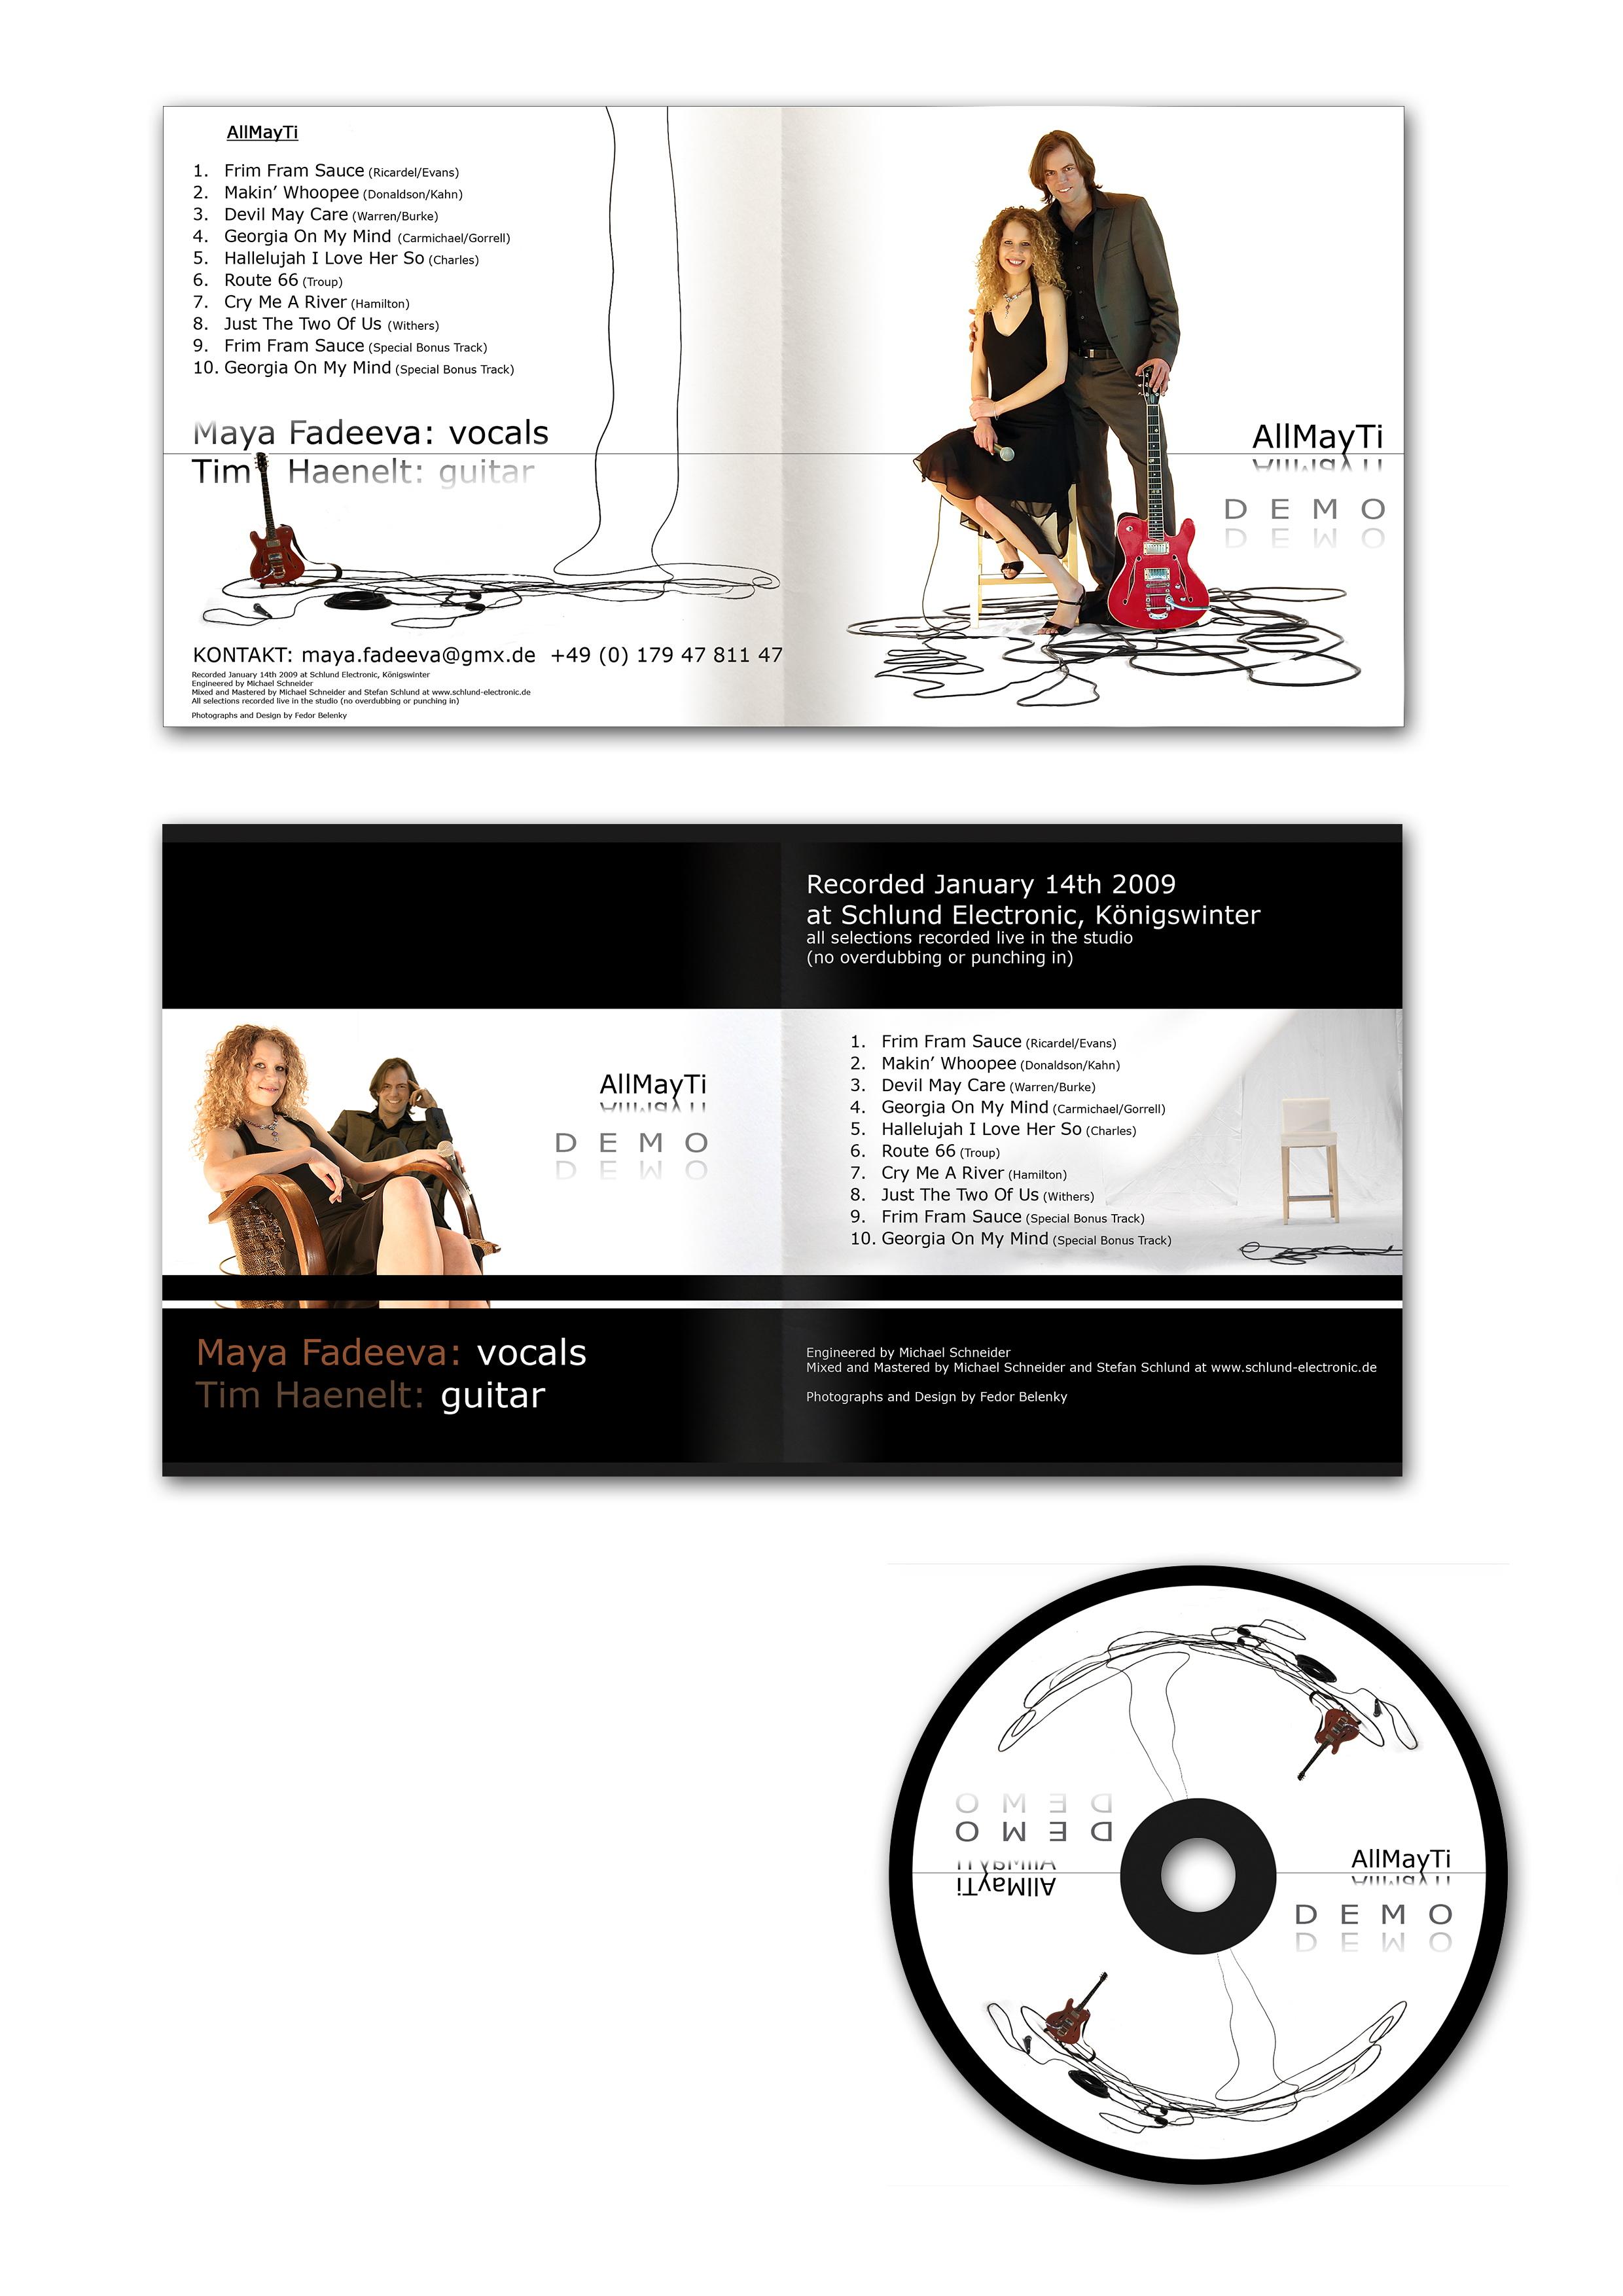 All MayTi - CD